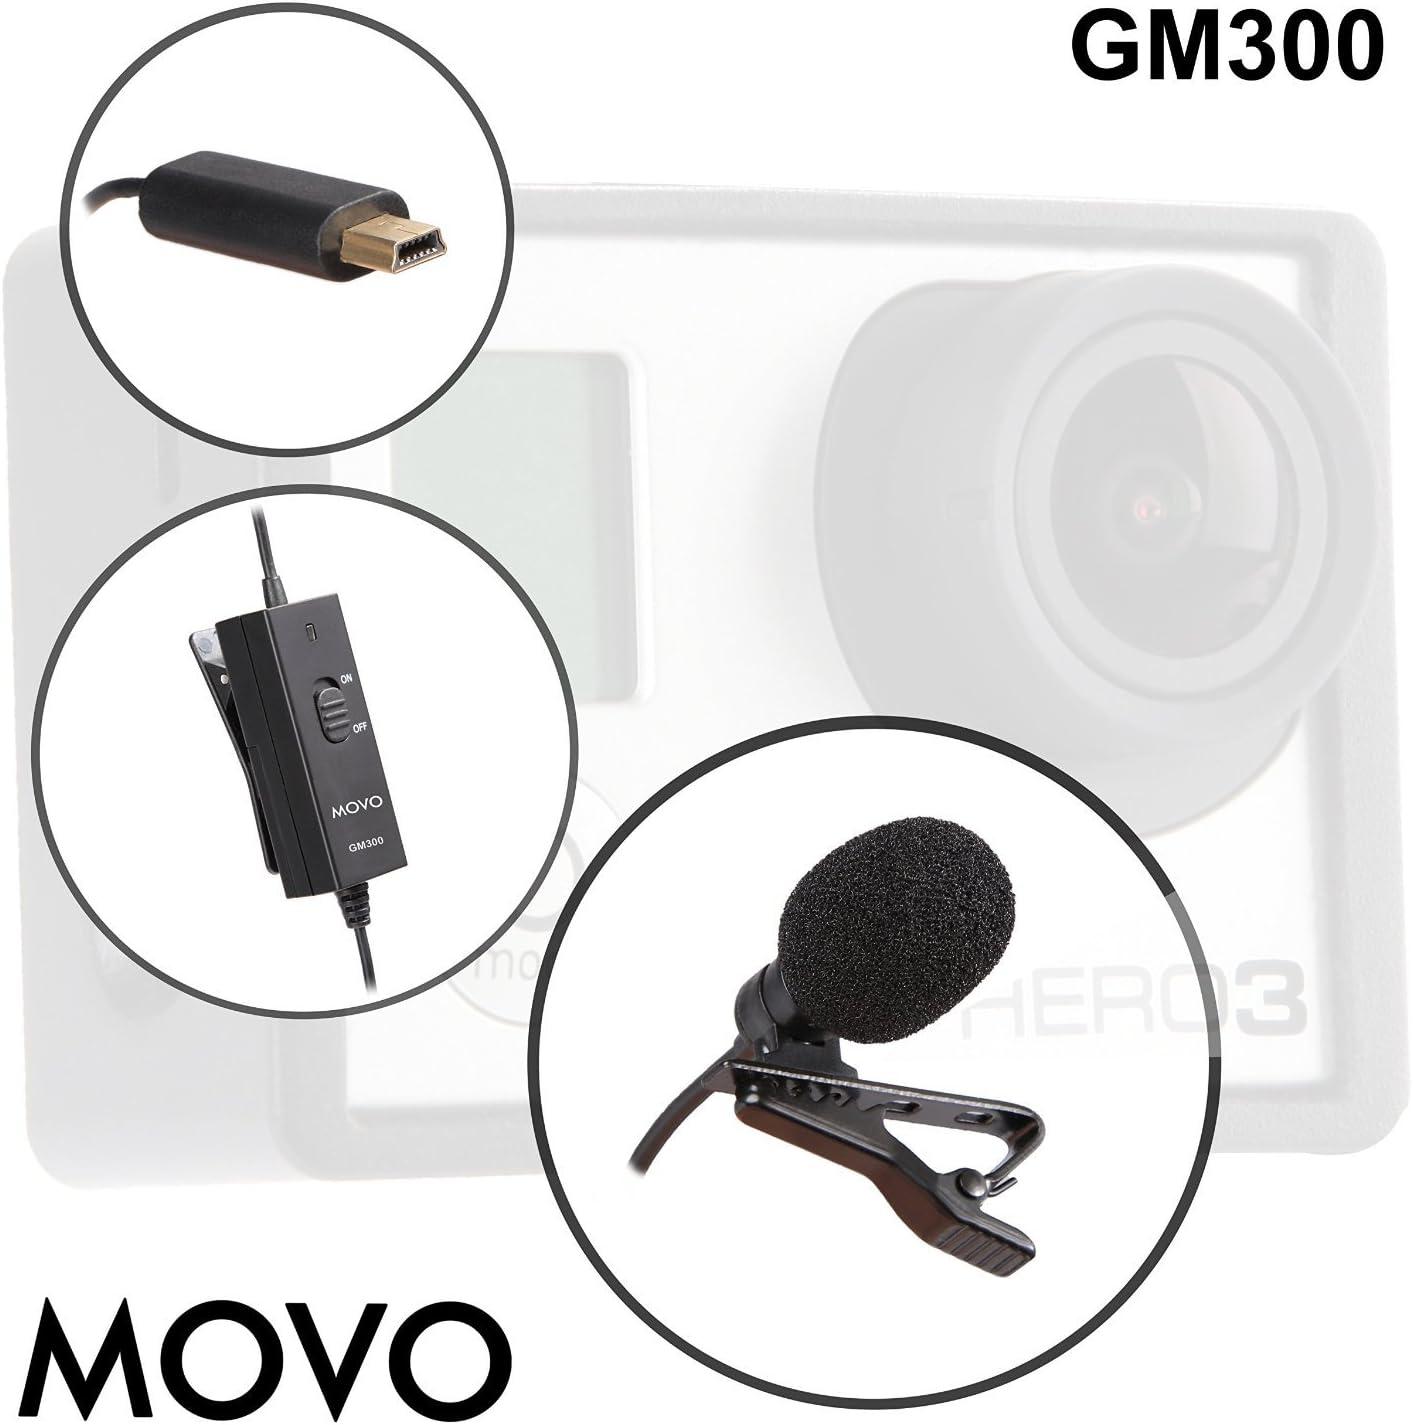 Movo GM300 Micrófono de Solapa Corbata Condensador Omnidireccional ...